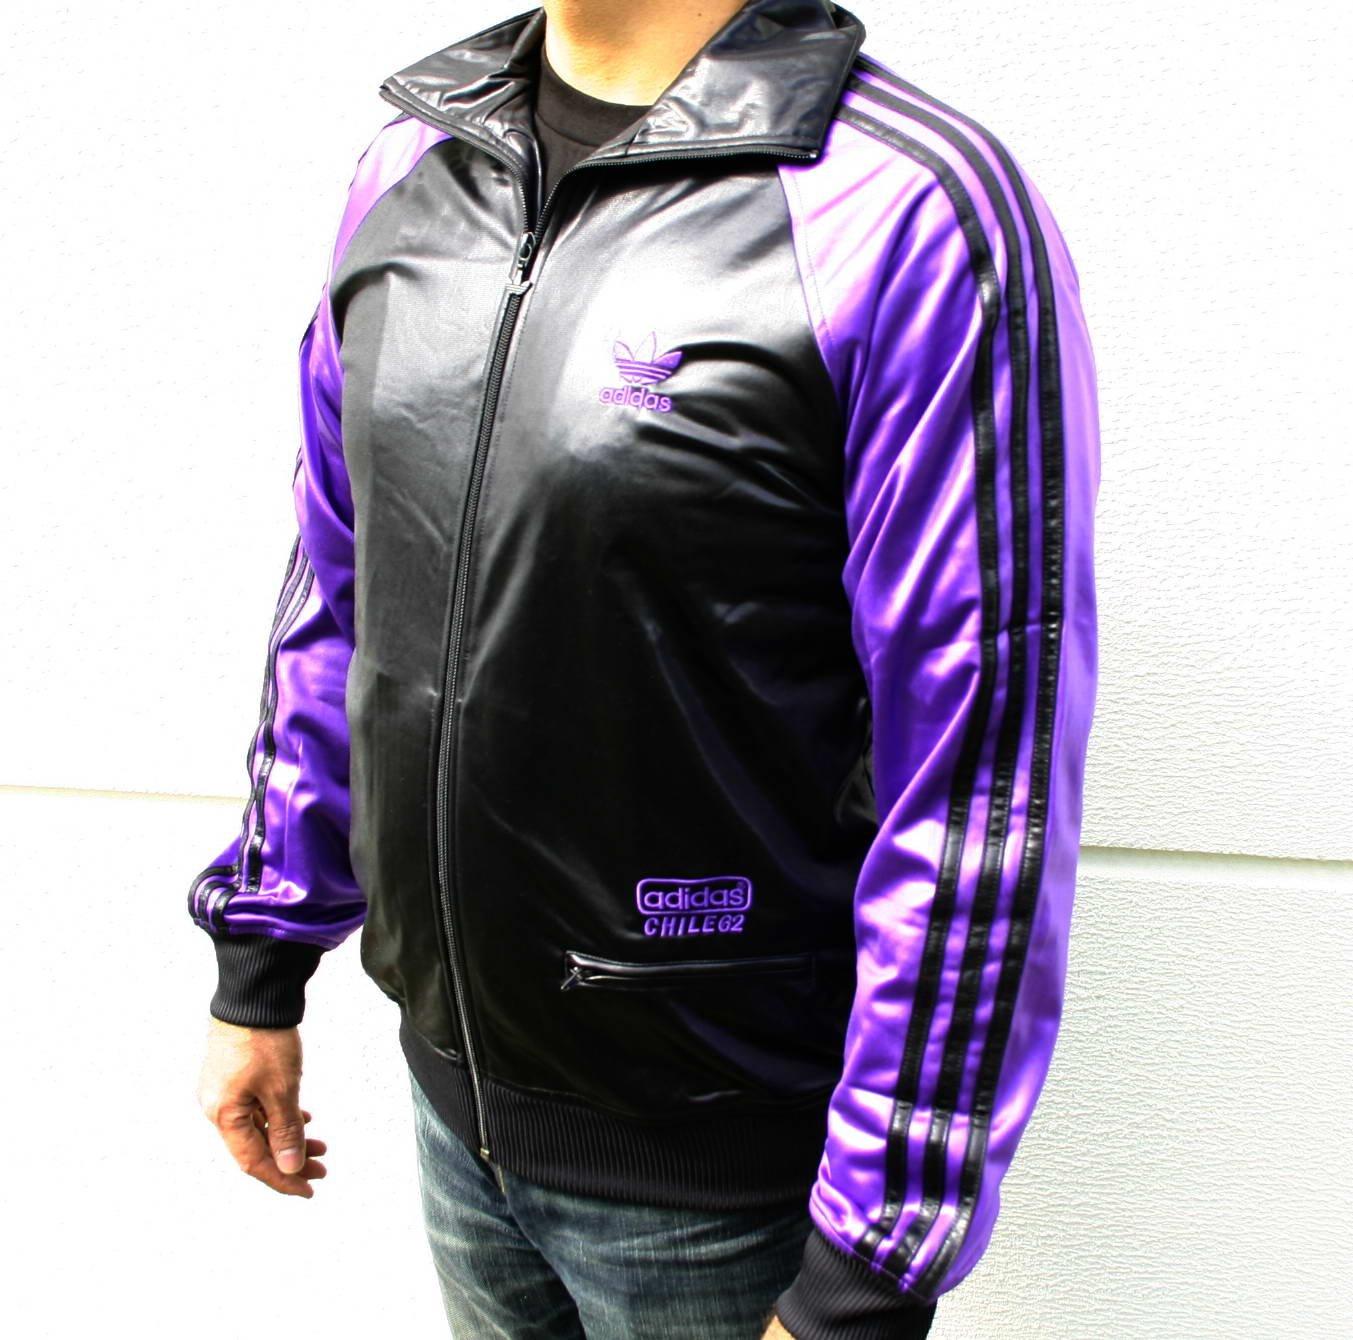 adidas Originals Chile 62 Colblo TT Jacke Sportjacke schwarz lila Herren